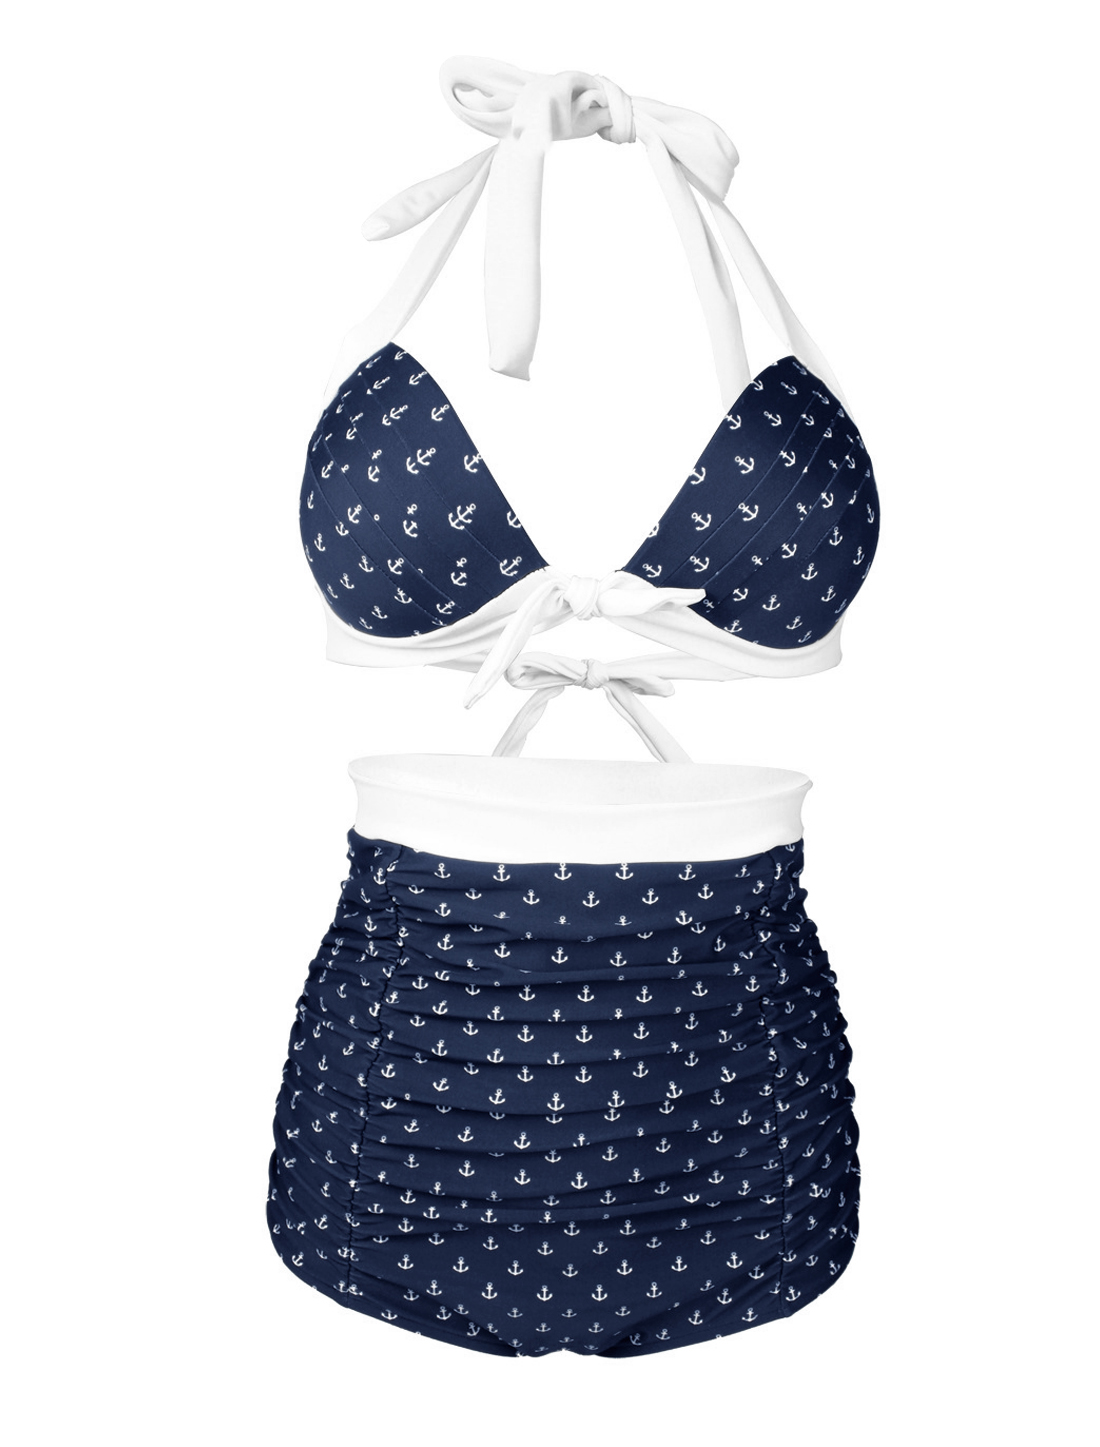 Women Vintage High Waist Halter Push Up Bikini Ruched Anchors Retro Bathing Suit XL